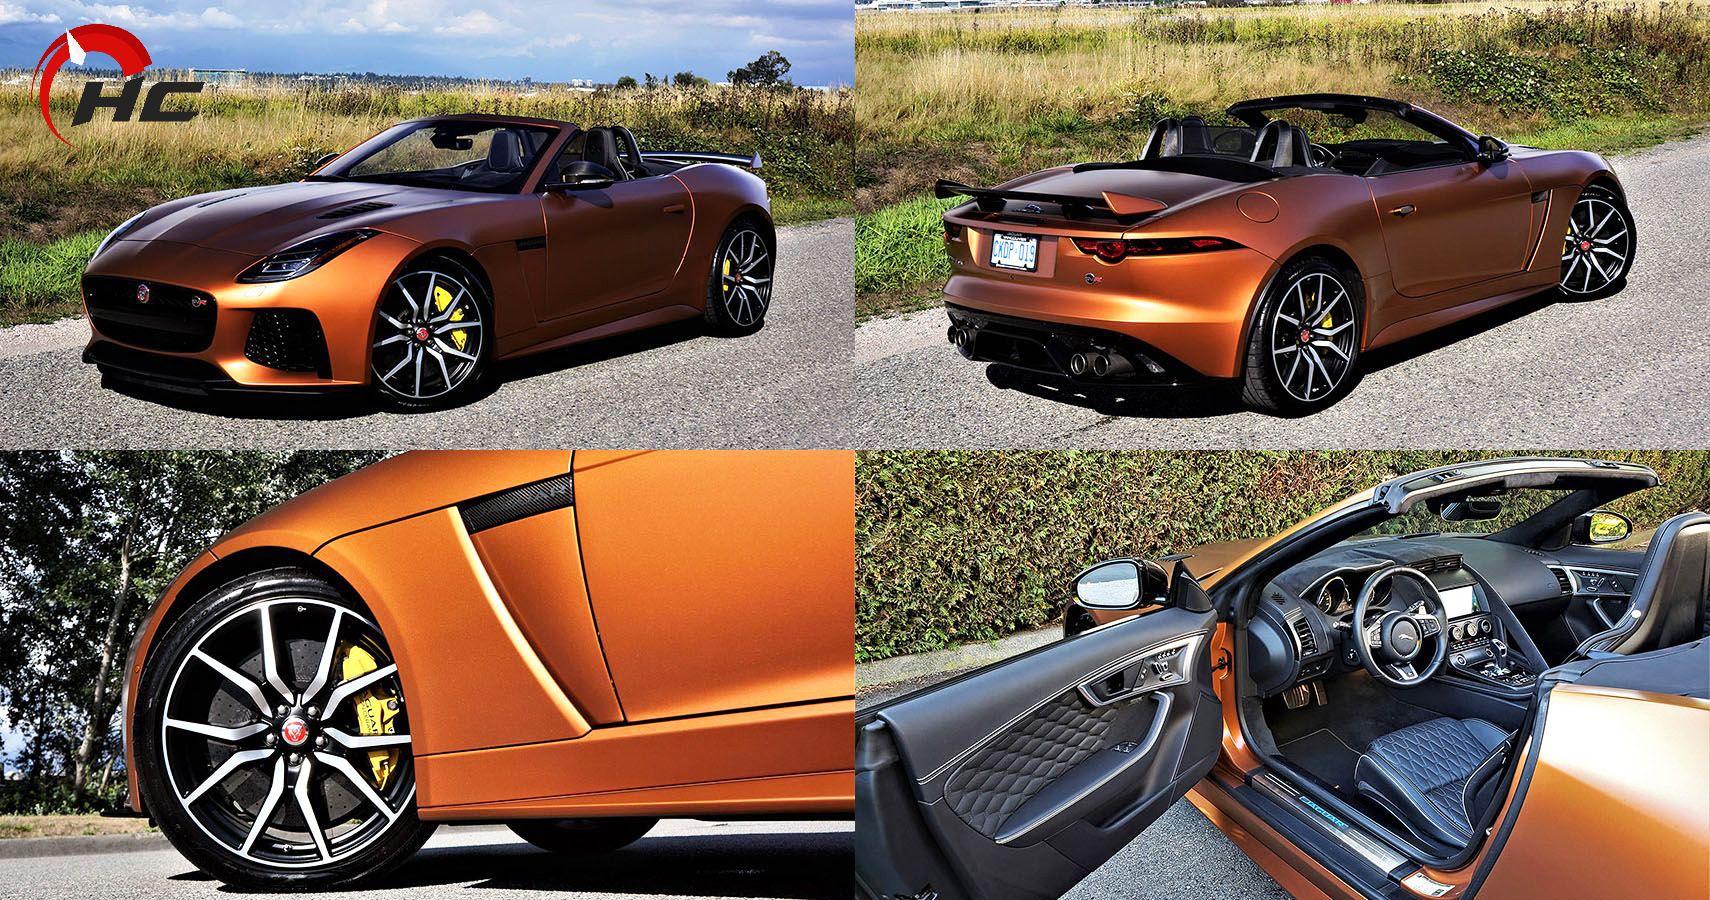 2020 Jaguar F-Type SVR Convertible Review: A Supercar For ...